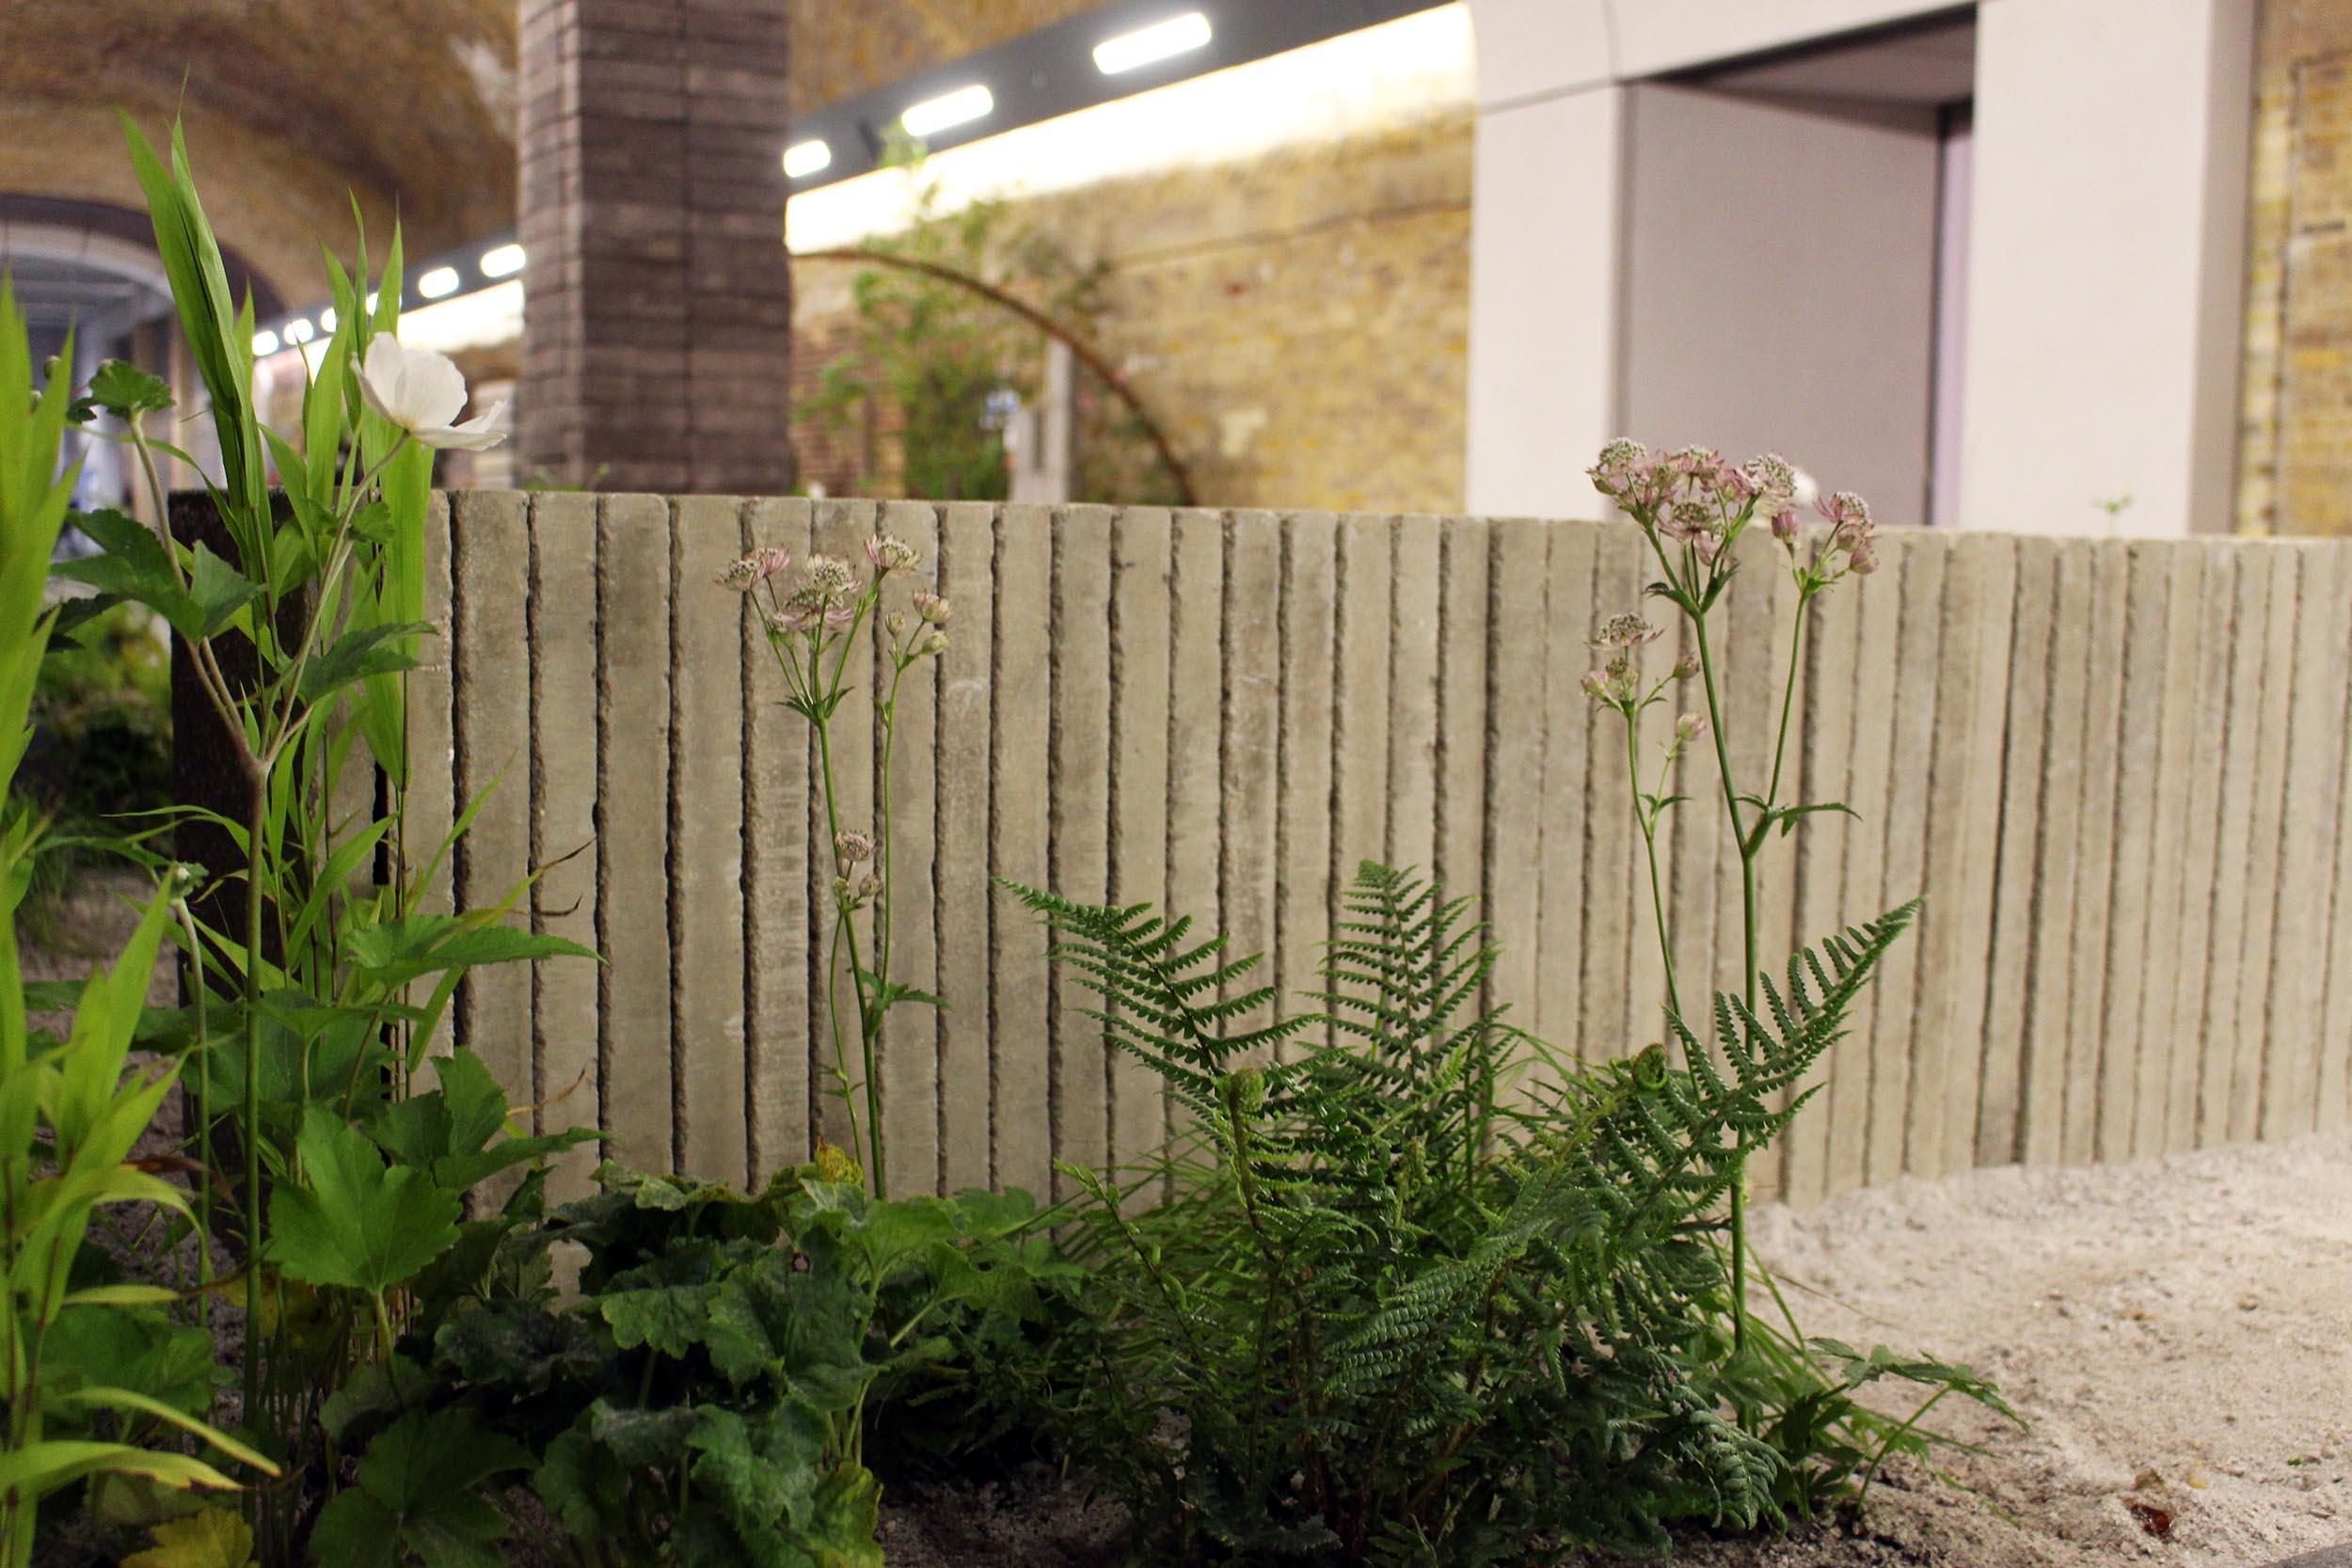 london-bridge-garden-bench-concrete-stacked-sculpture.jpg